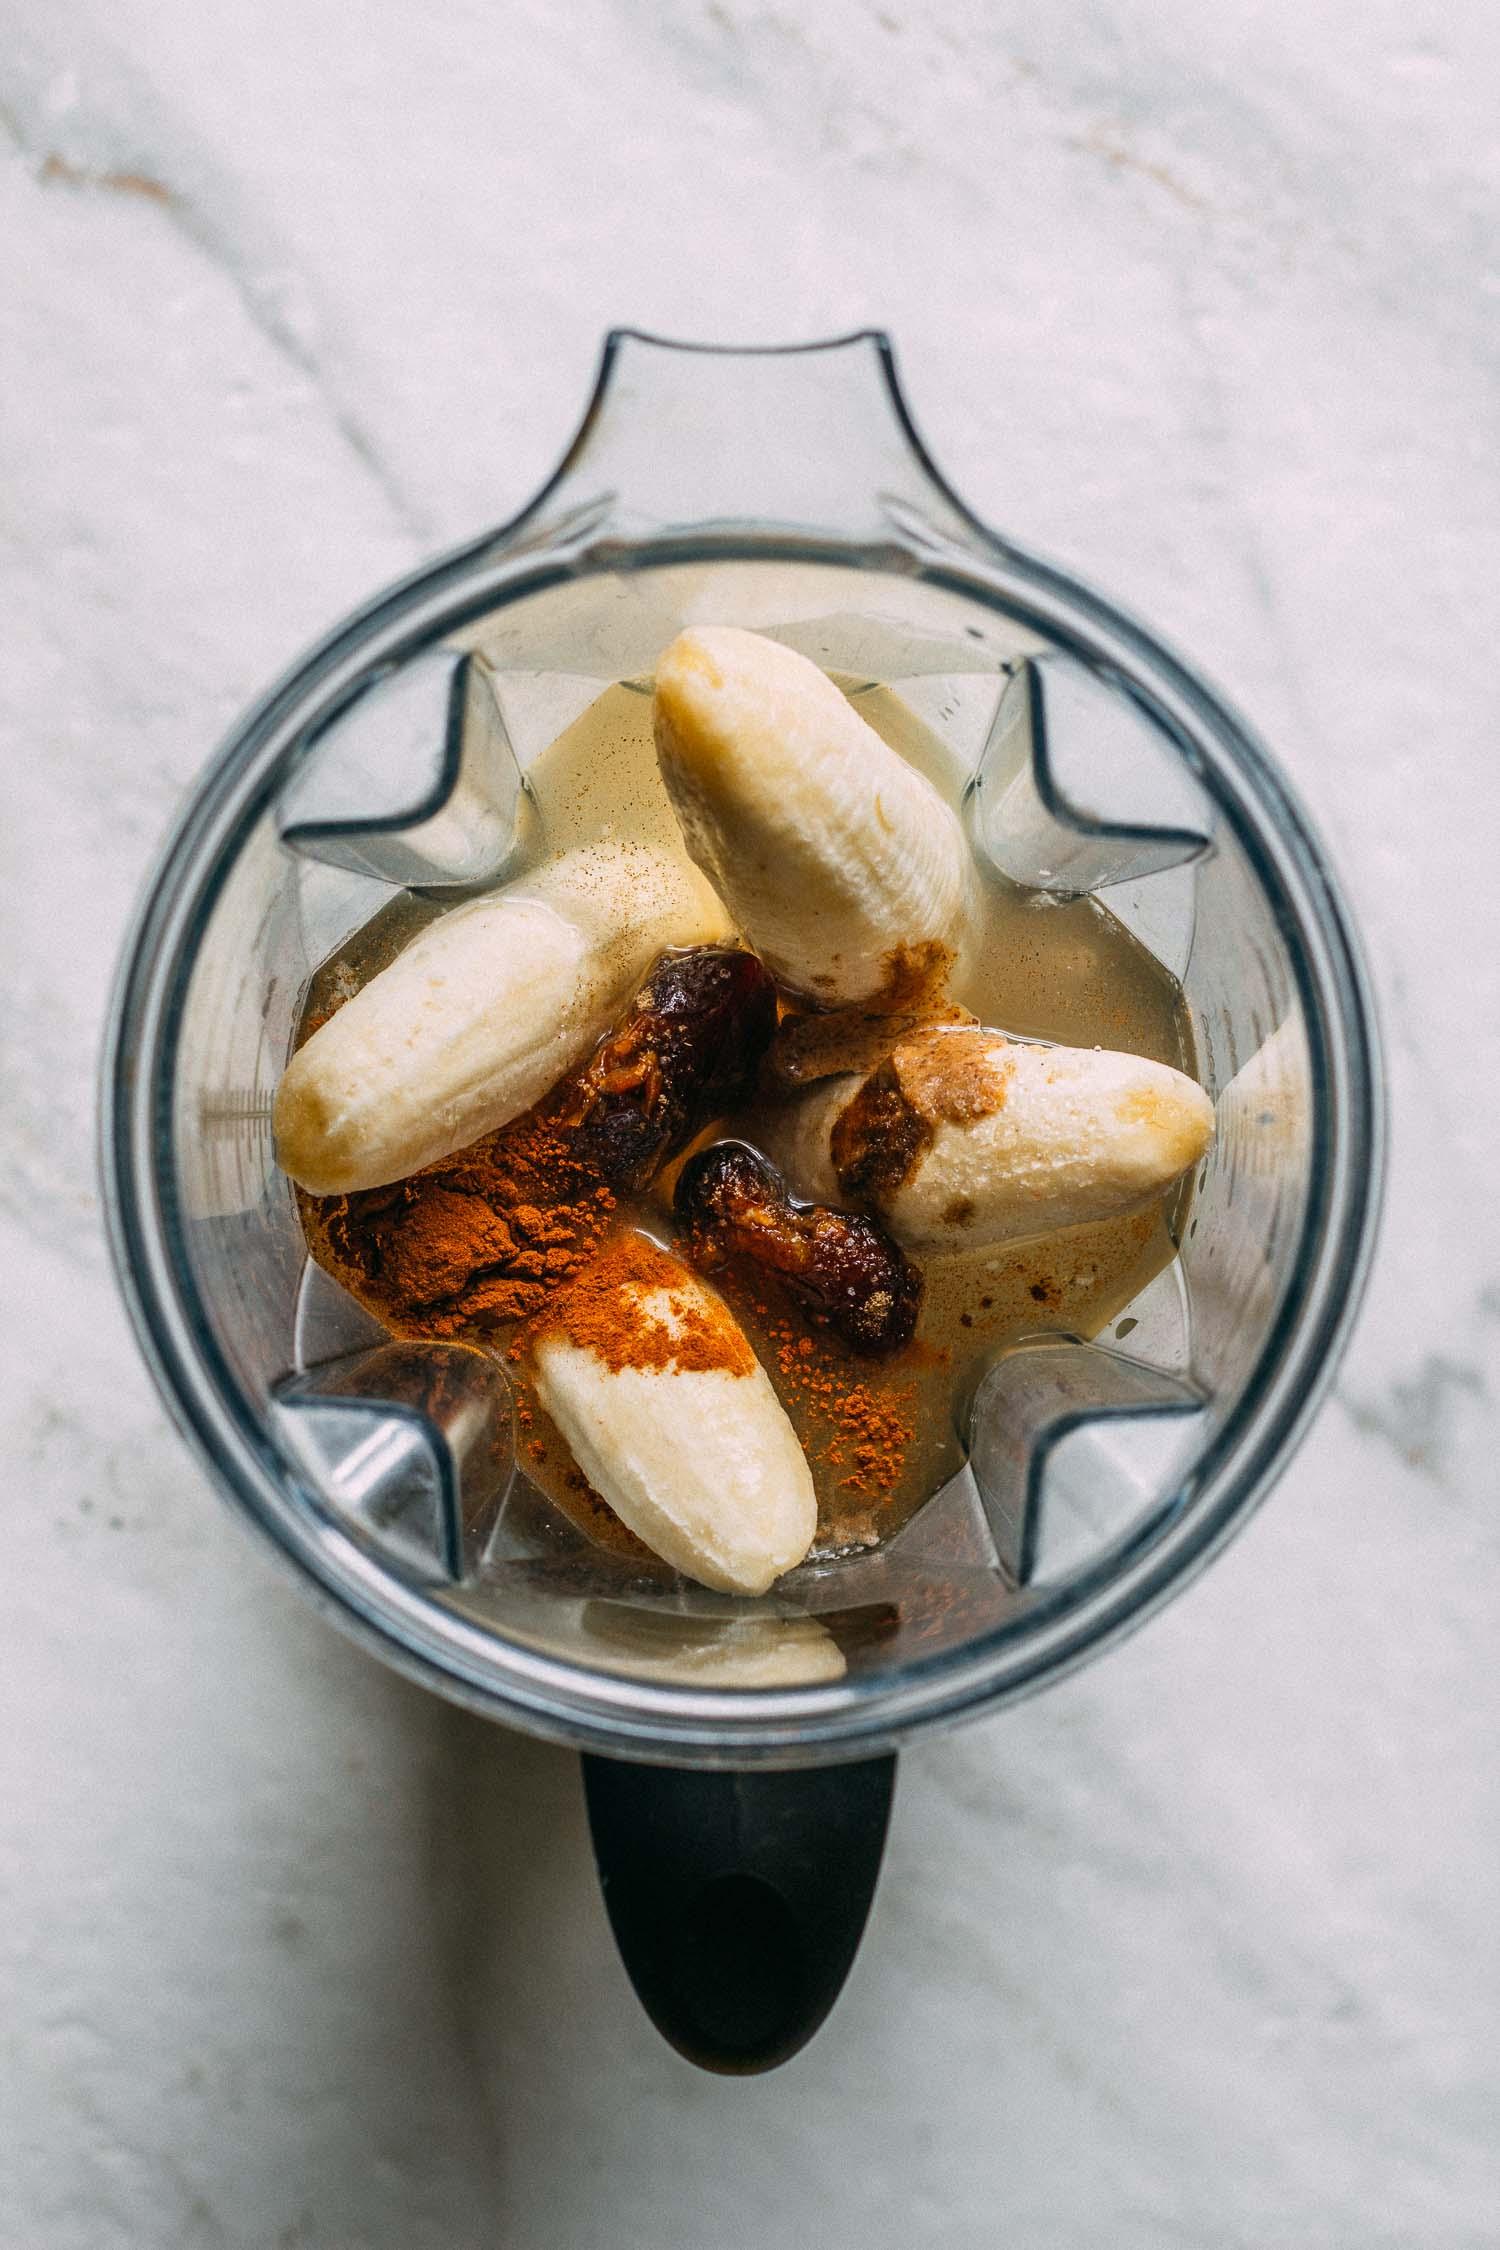 Creamy Cardamom Banana Milk #vegetarian #nondairy #gluten-free #milk #breakfast #recipe